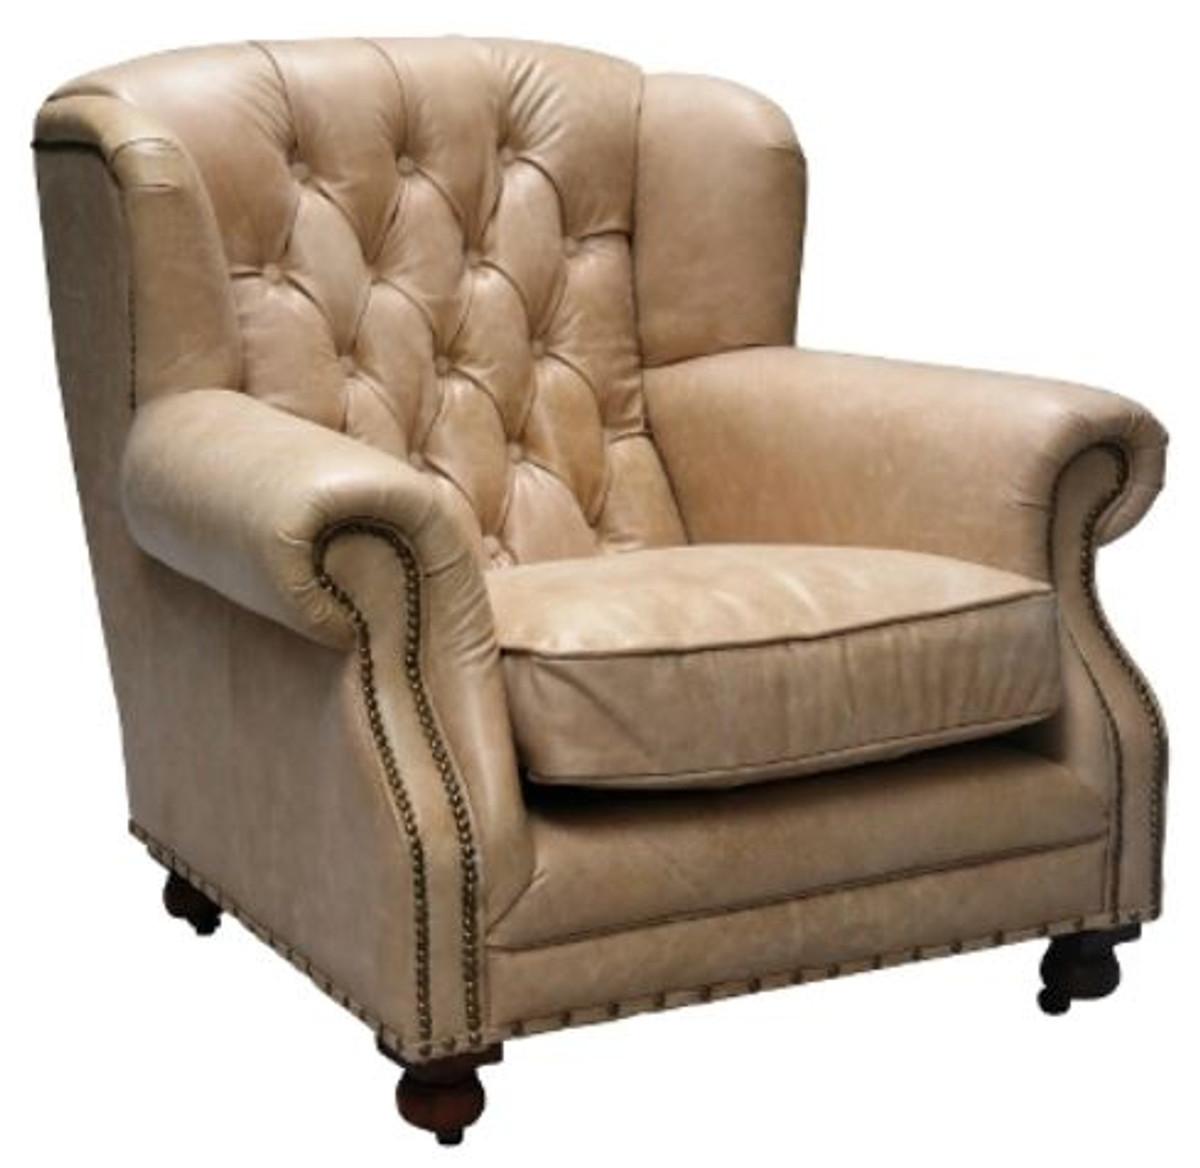 Casa Padrino Luxus Echtleder Sessel Beige 92 X 97 X H 89 Cm